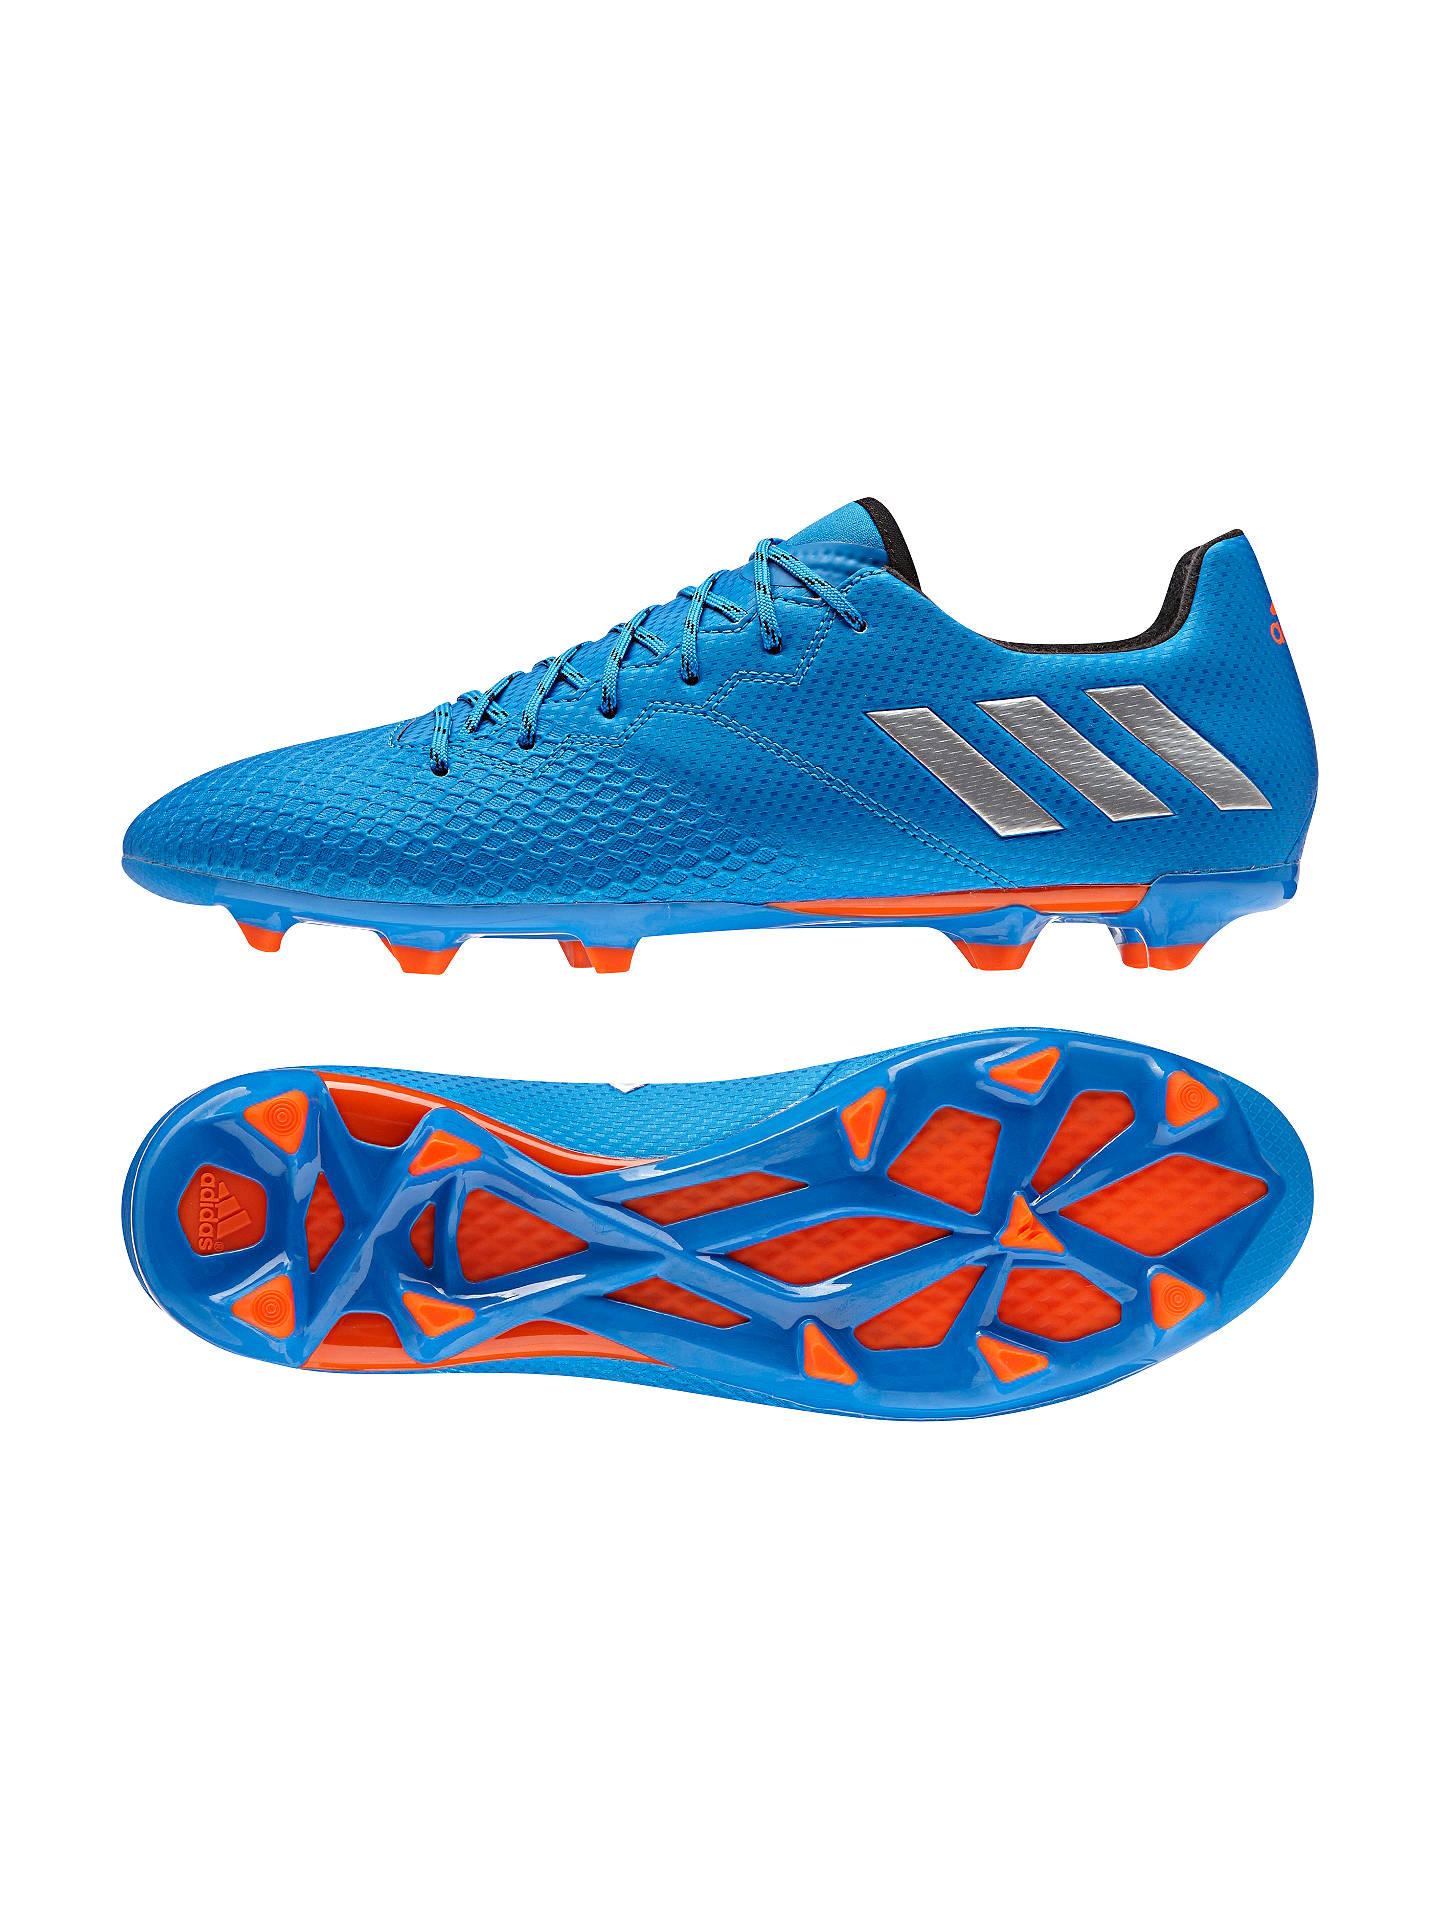 f60b6a35b7c ... Buy Adidas Messi 16.3 FG Men s Football Boots